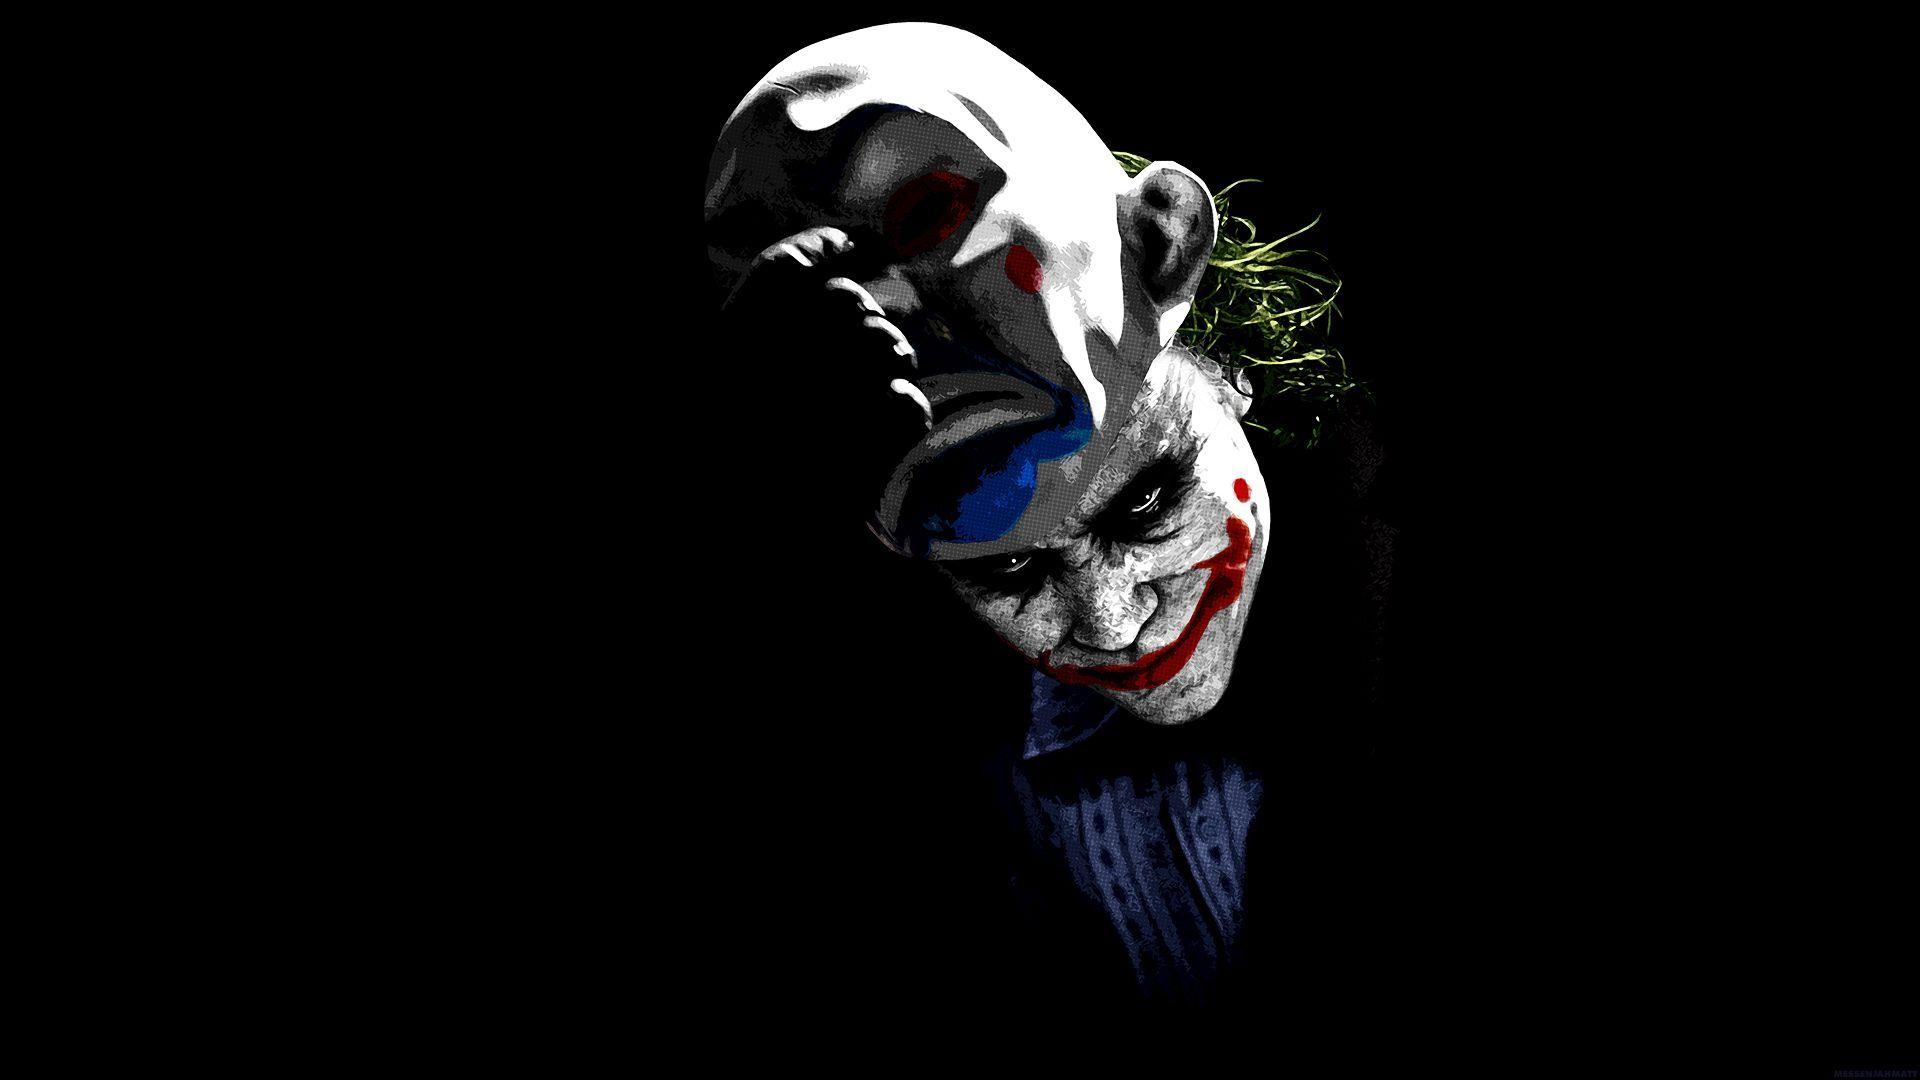 The Joker IPhone Wallpaper IPod HD Free Download 1920x1080